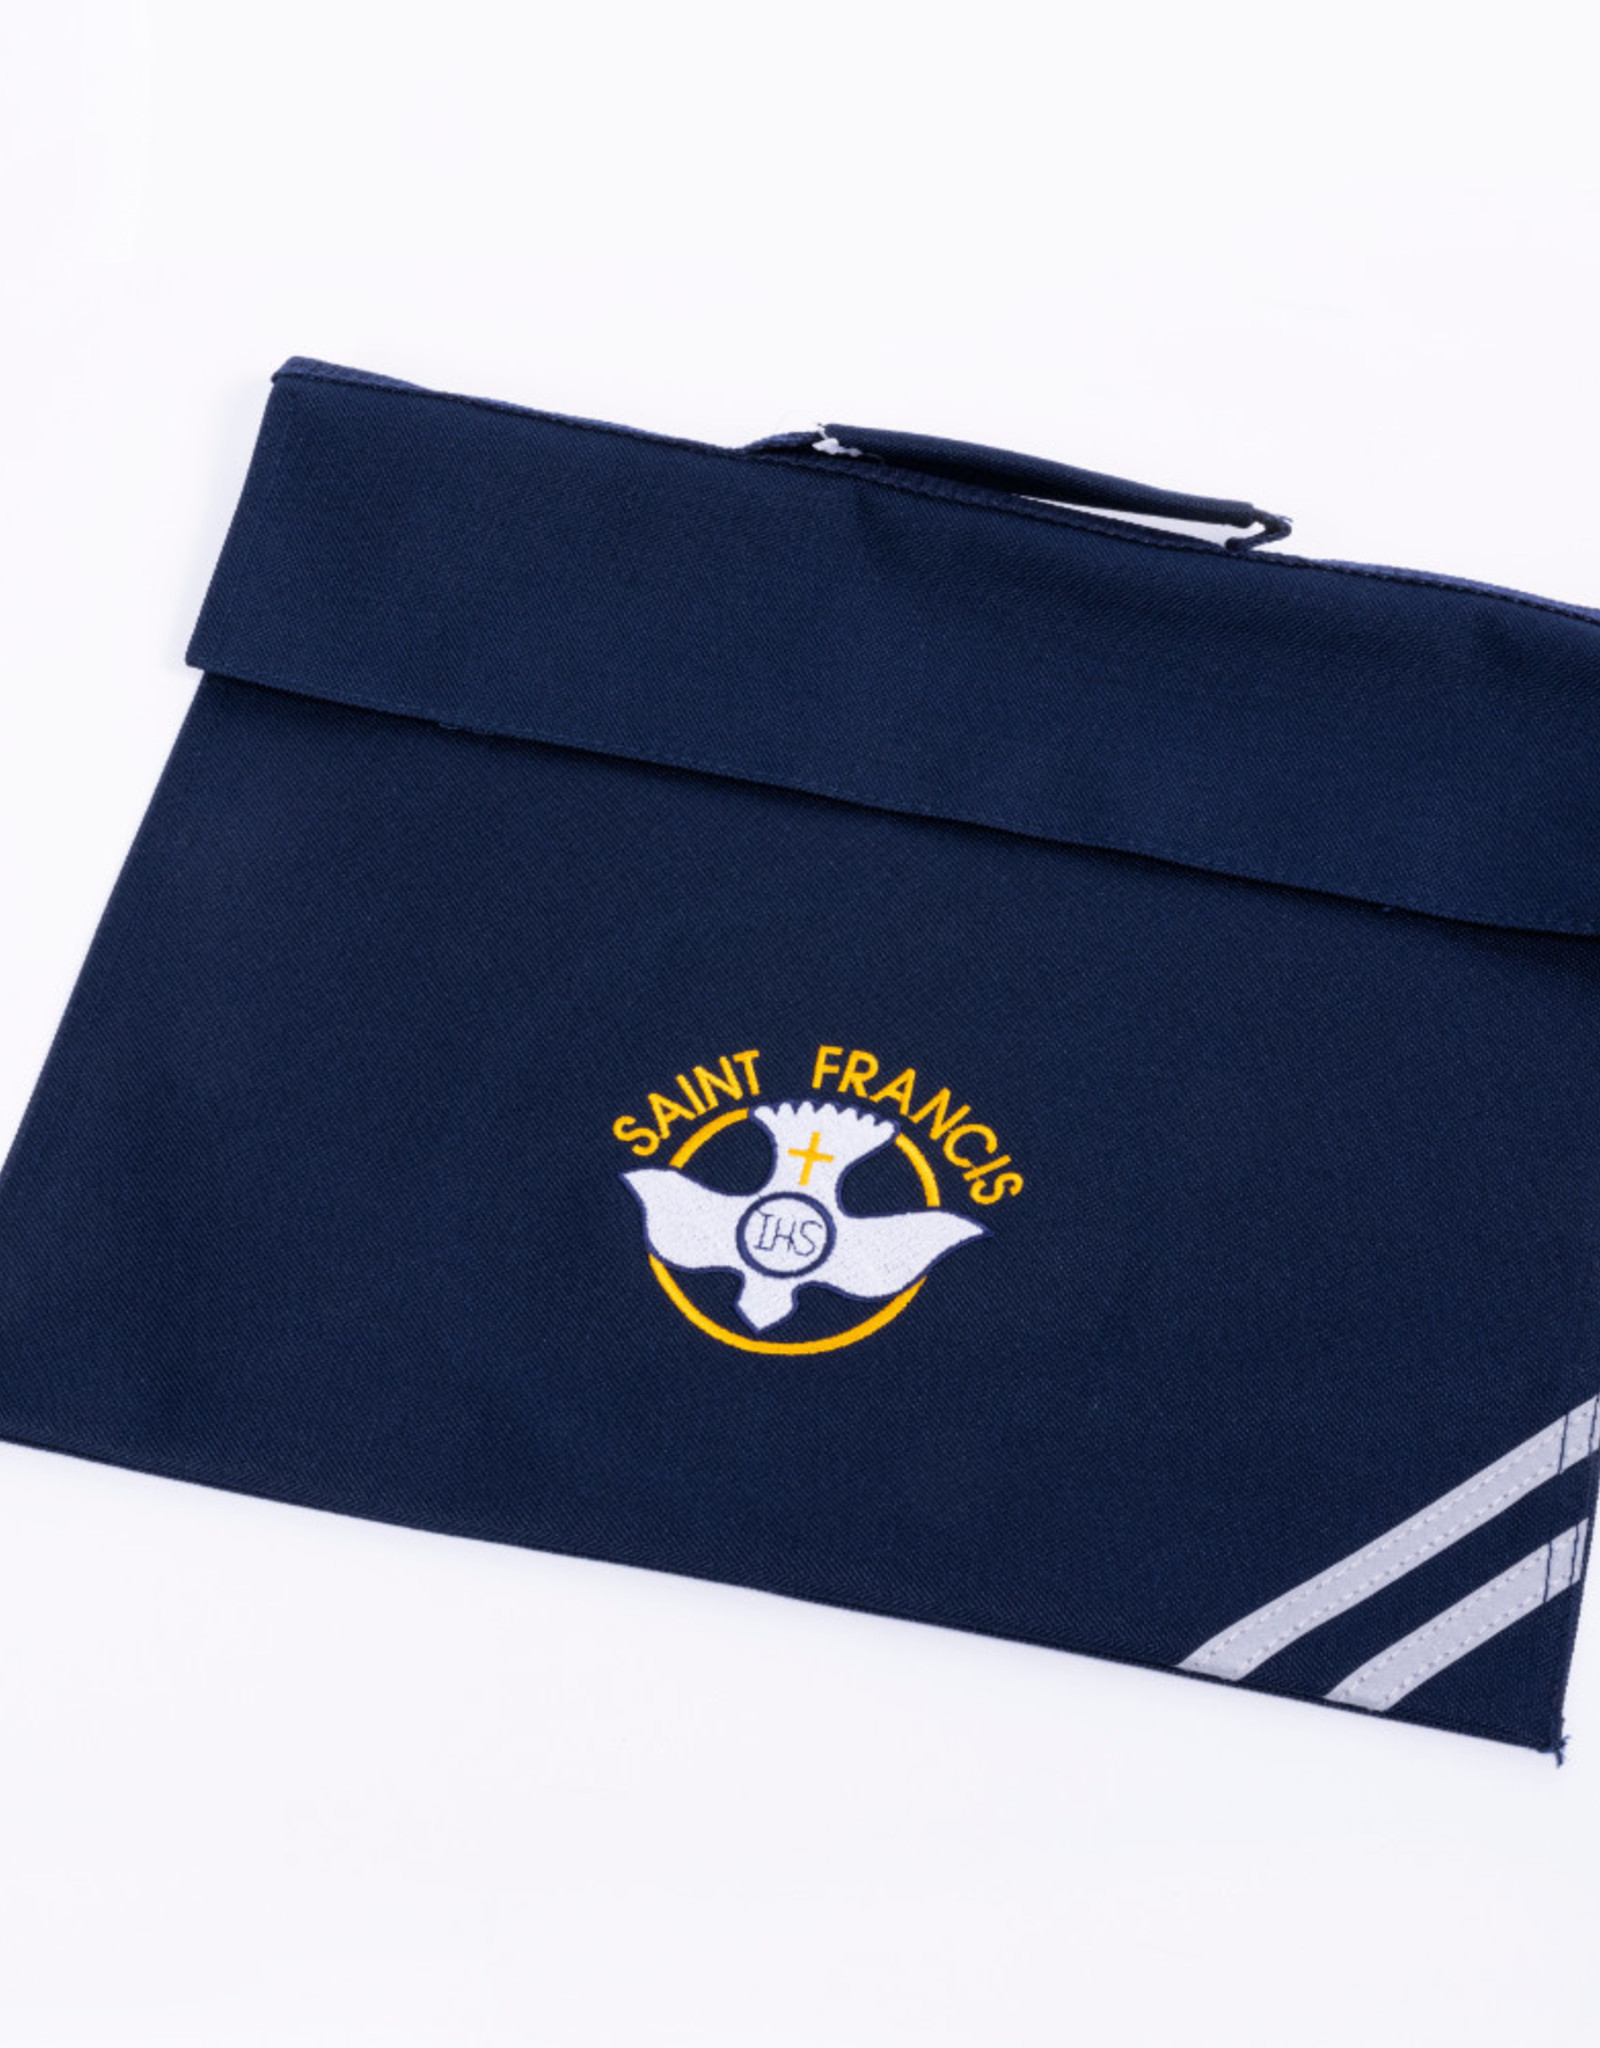 QUADRA Navy School Book Bag - St Francis Catholic Academy